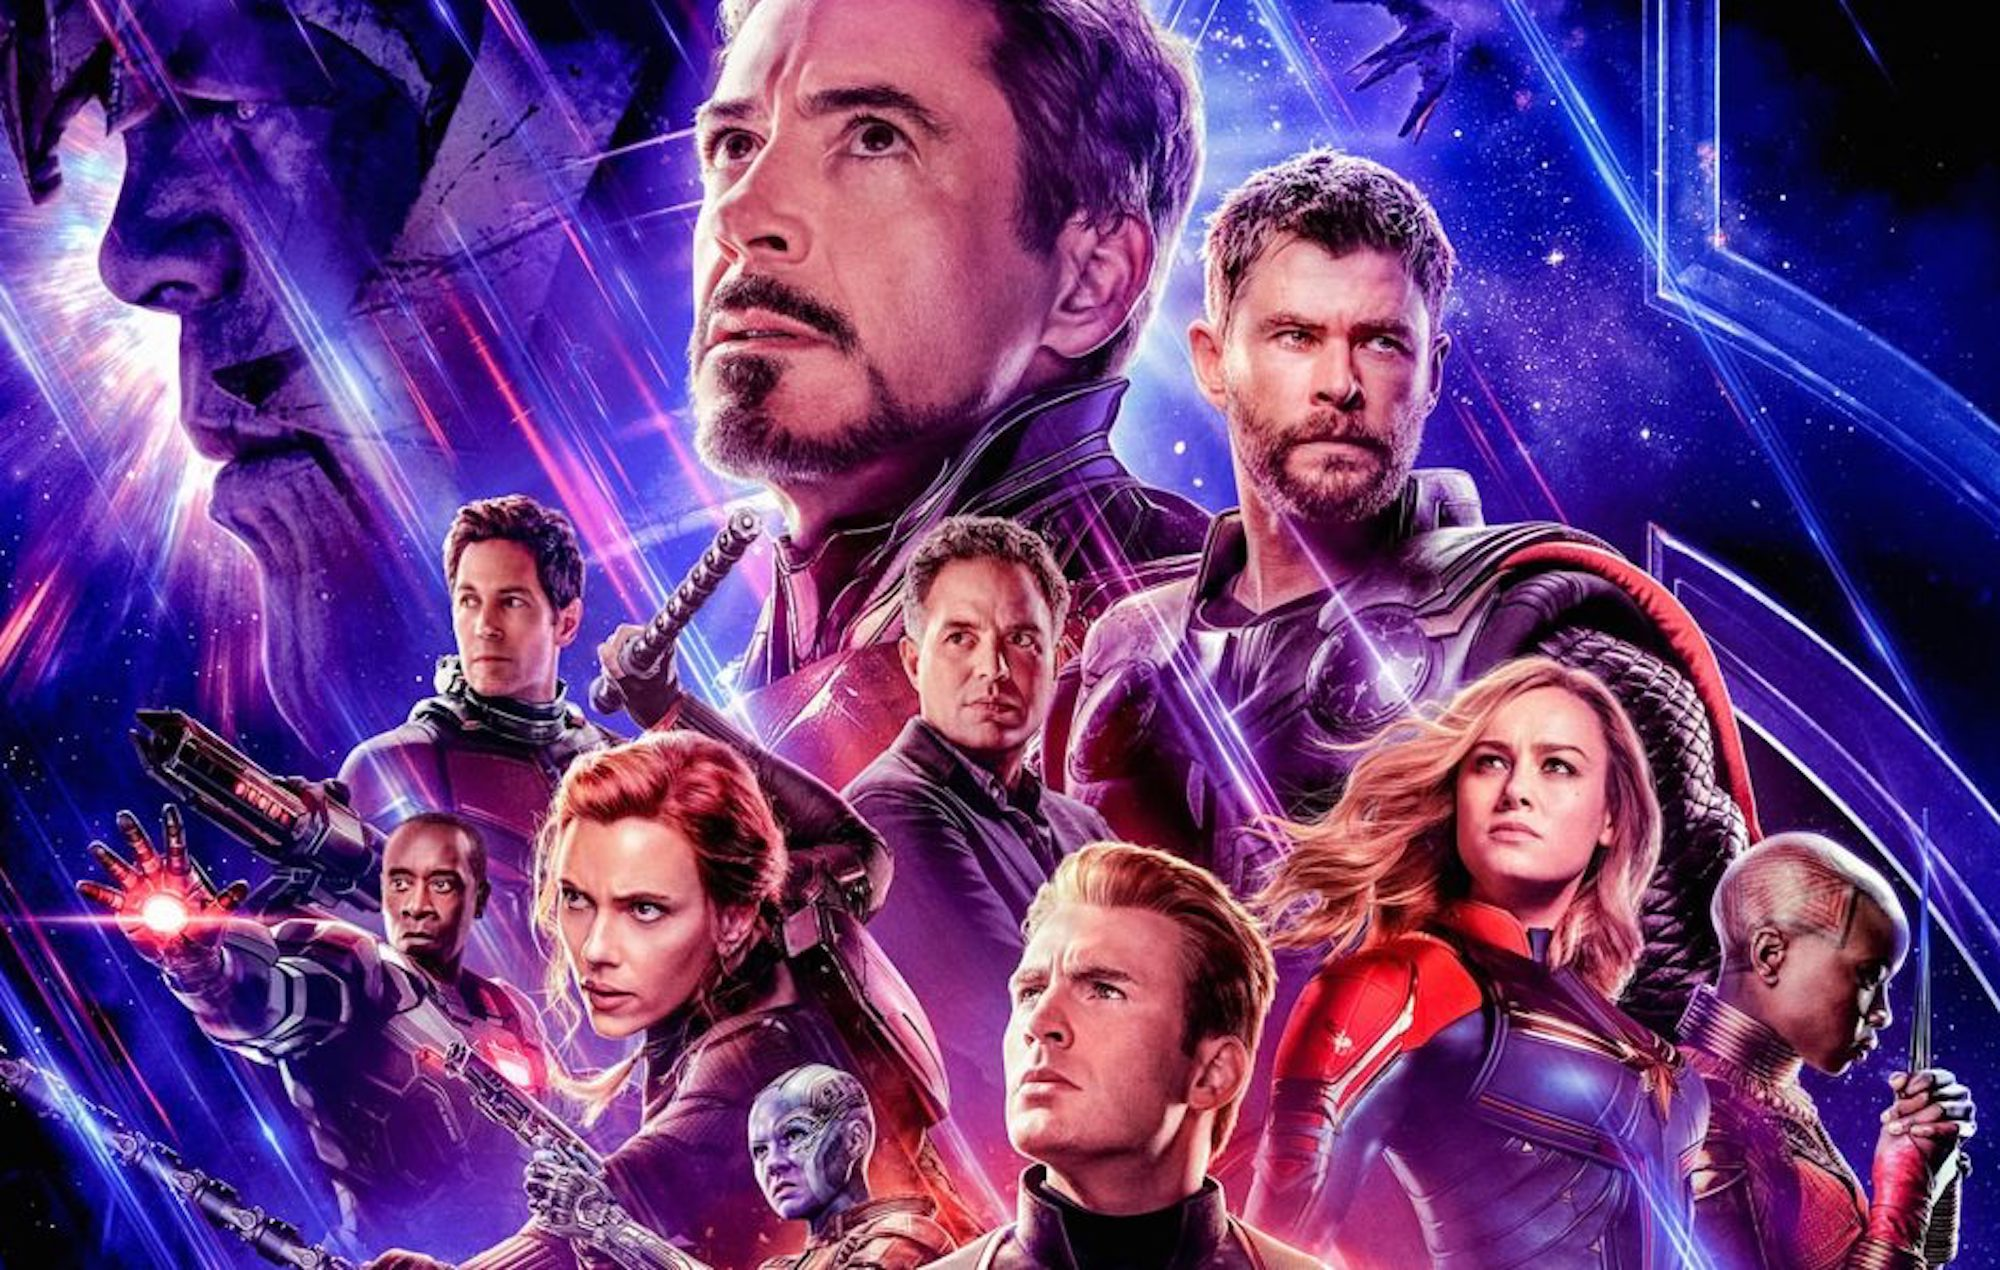 1. Avengers: Koniec gry - 310 696 756